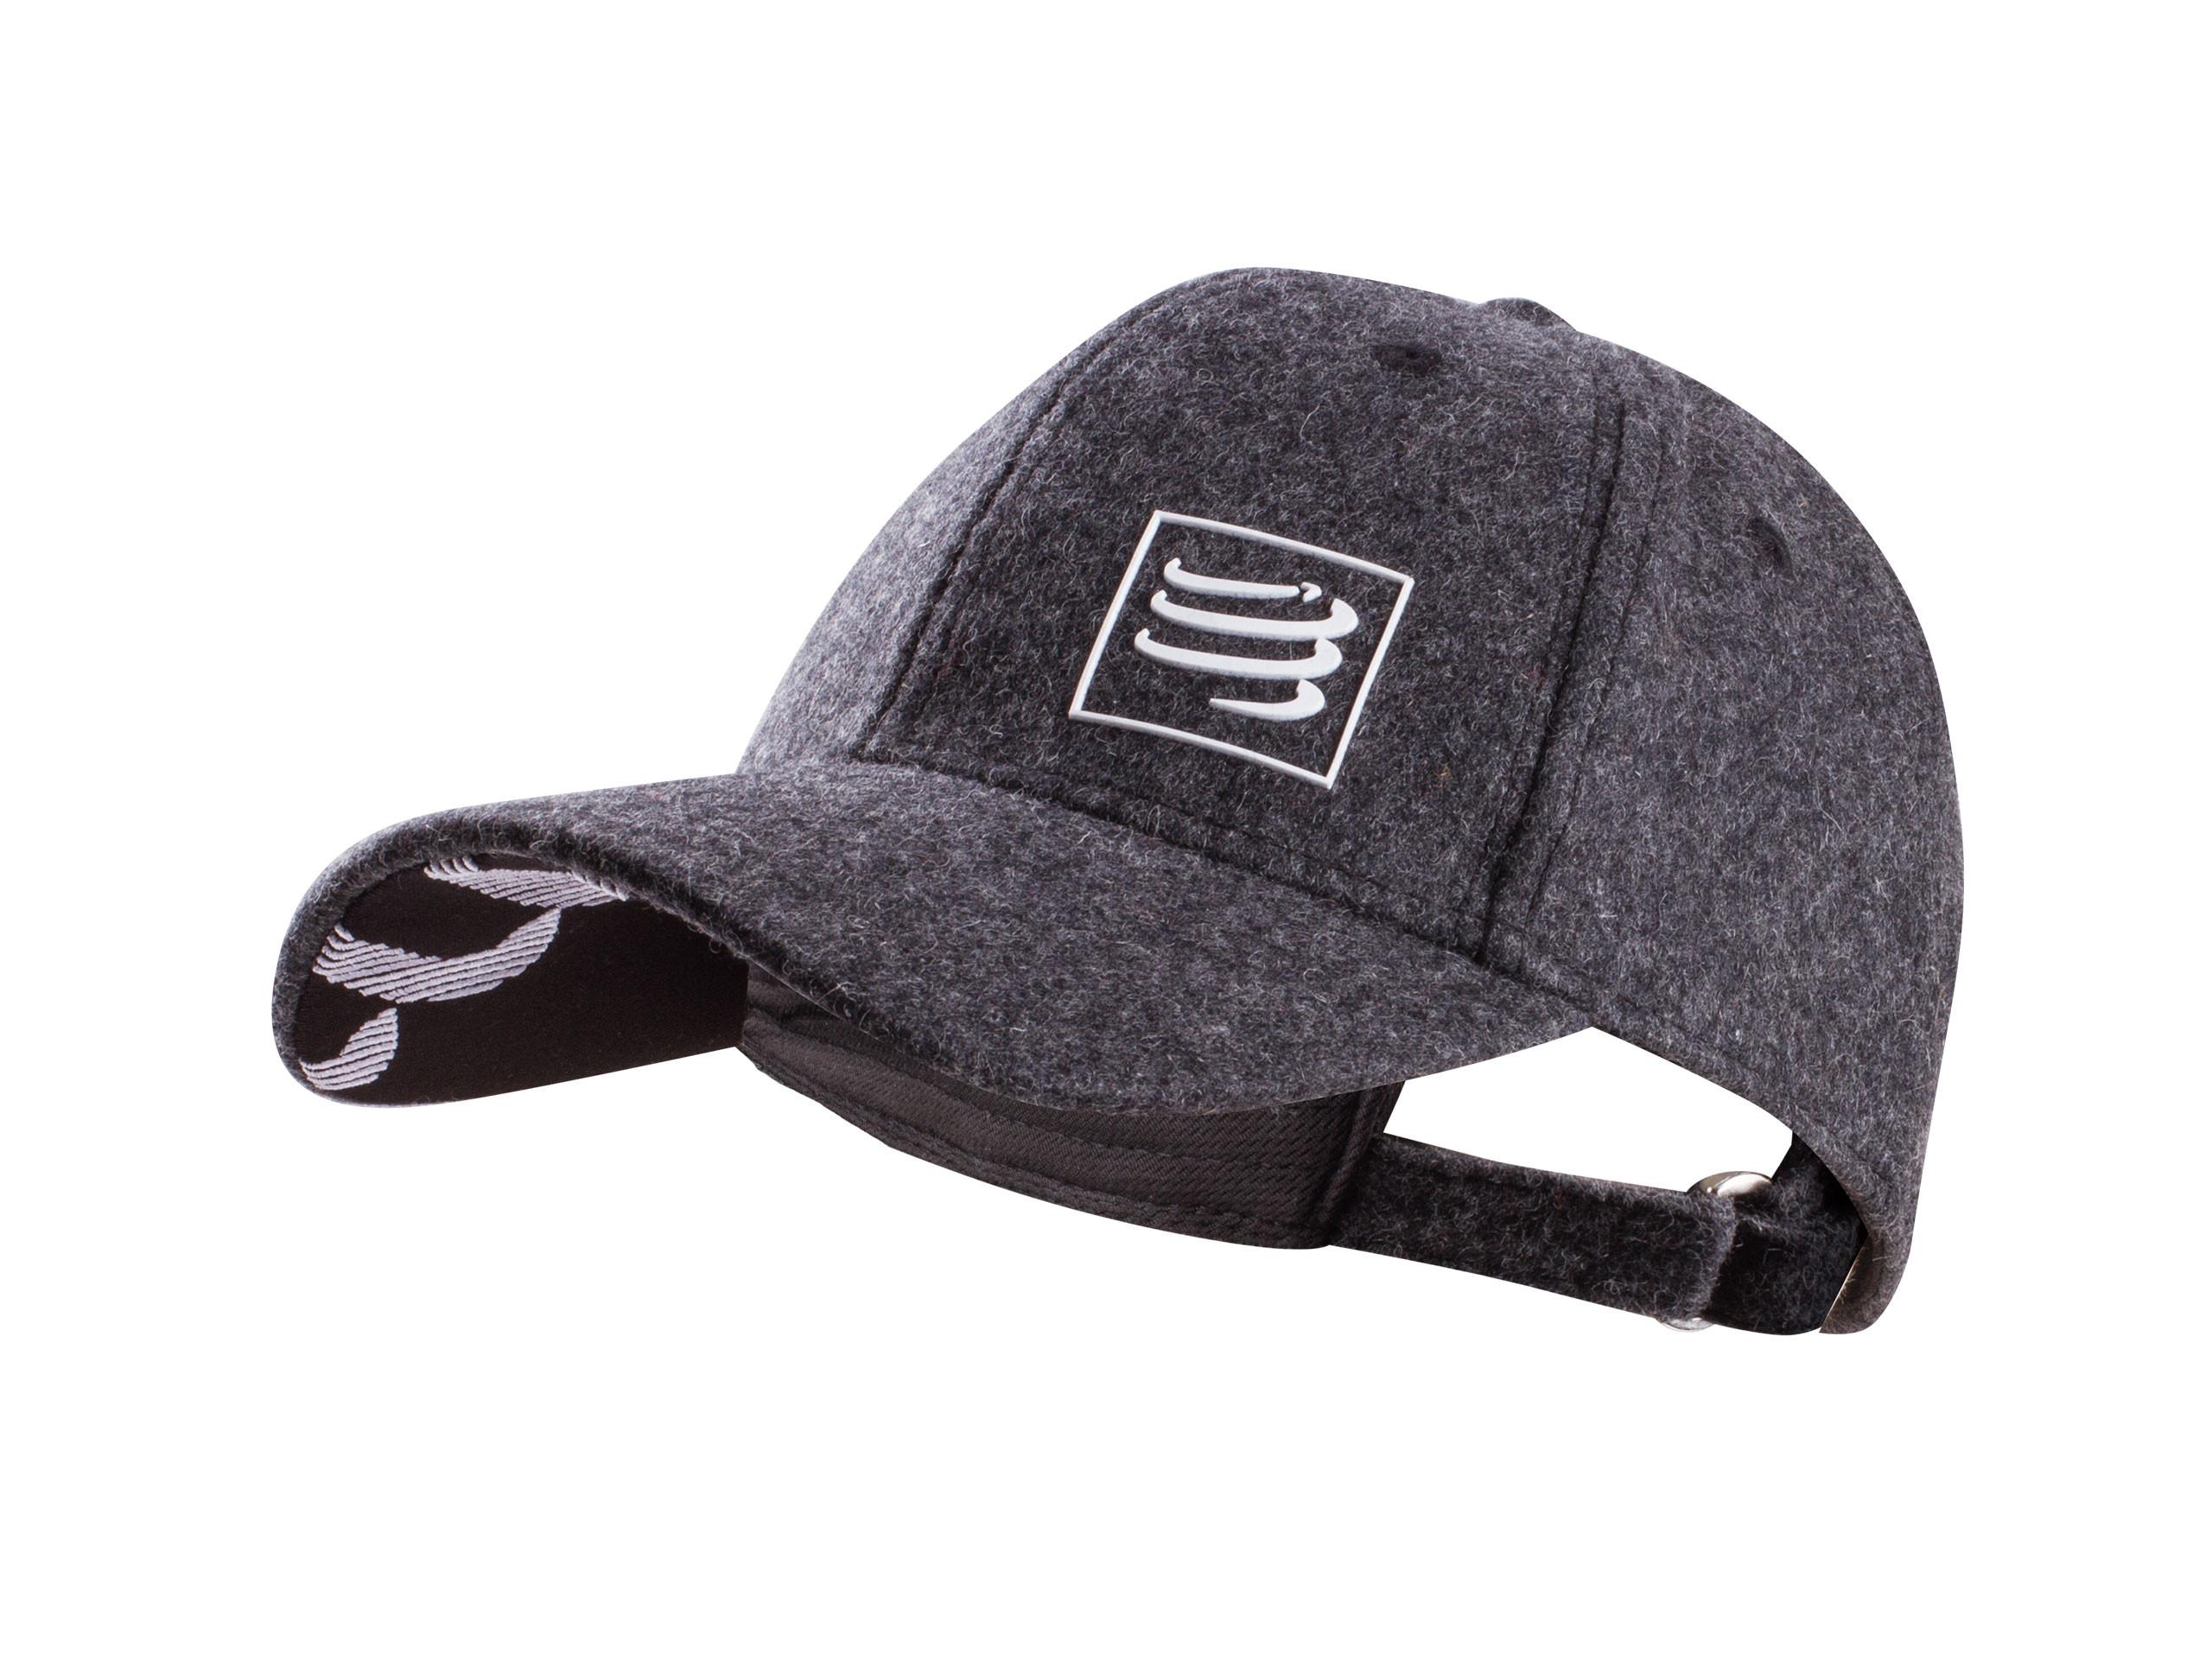 Gorra de lana gris jaspeado